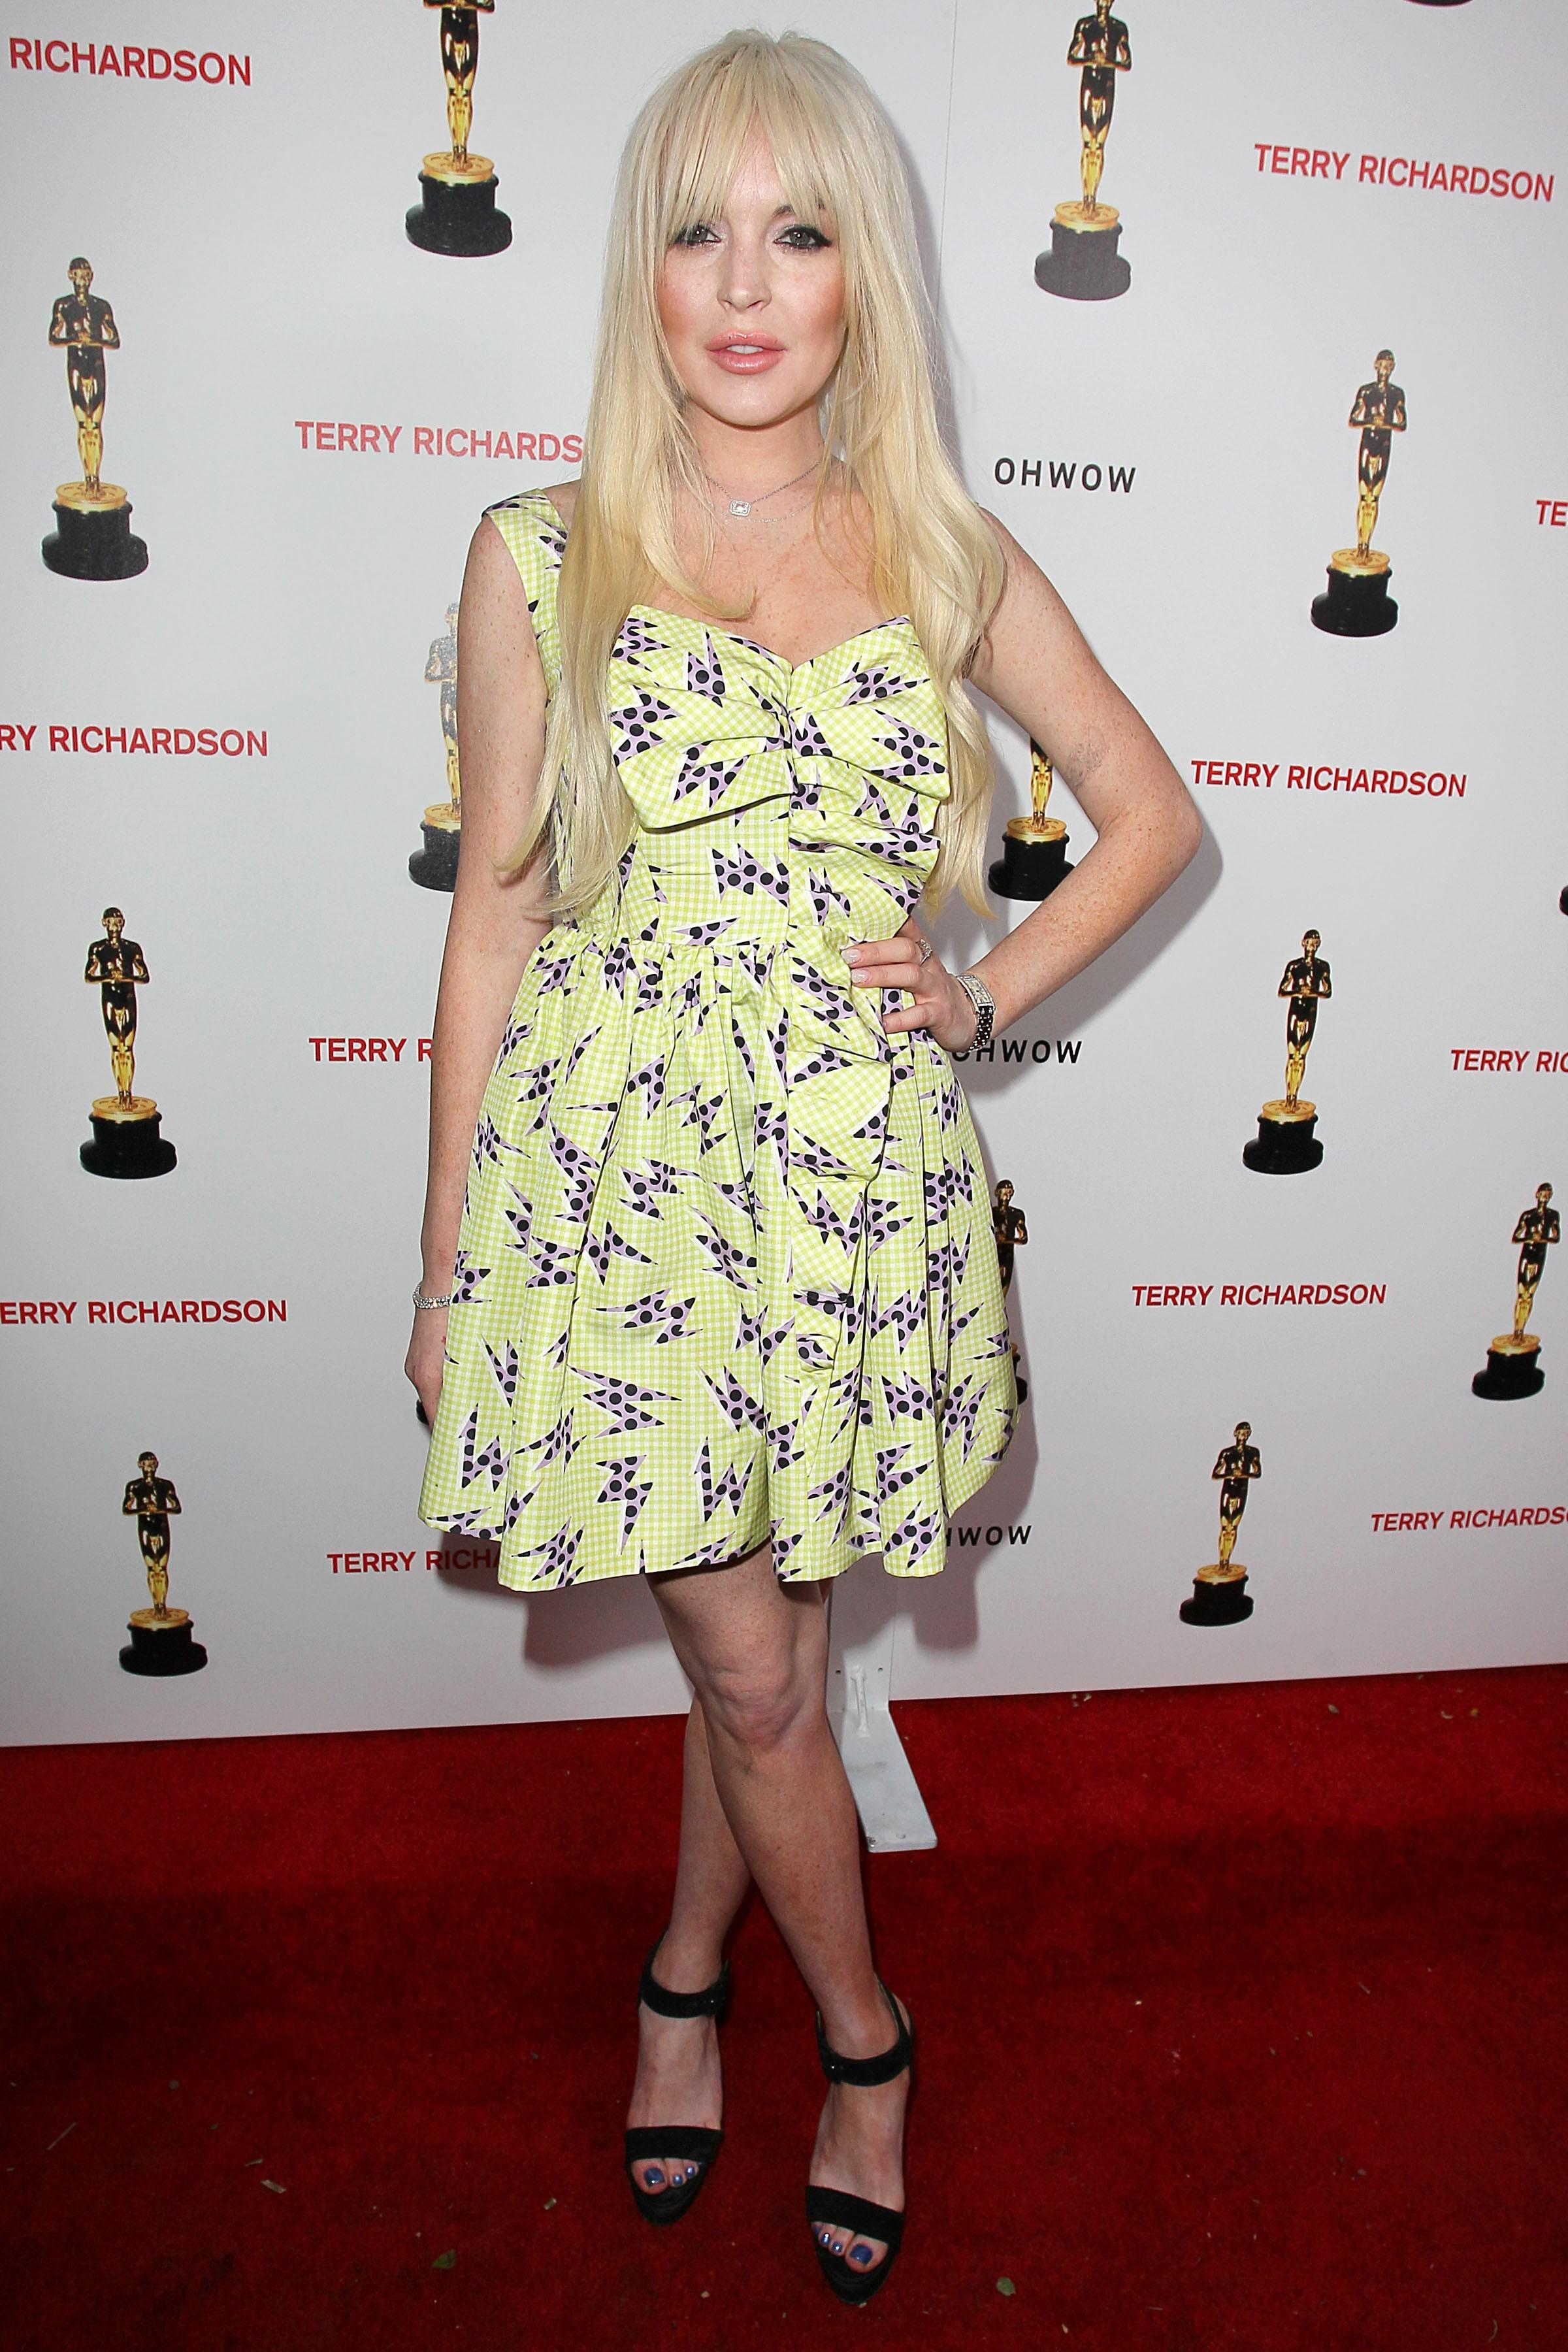 Lindsay lohan tanning bed georgia rule green dress blonde hair